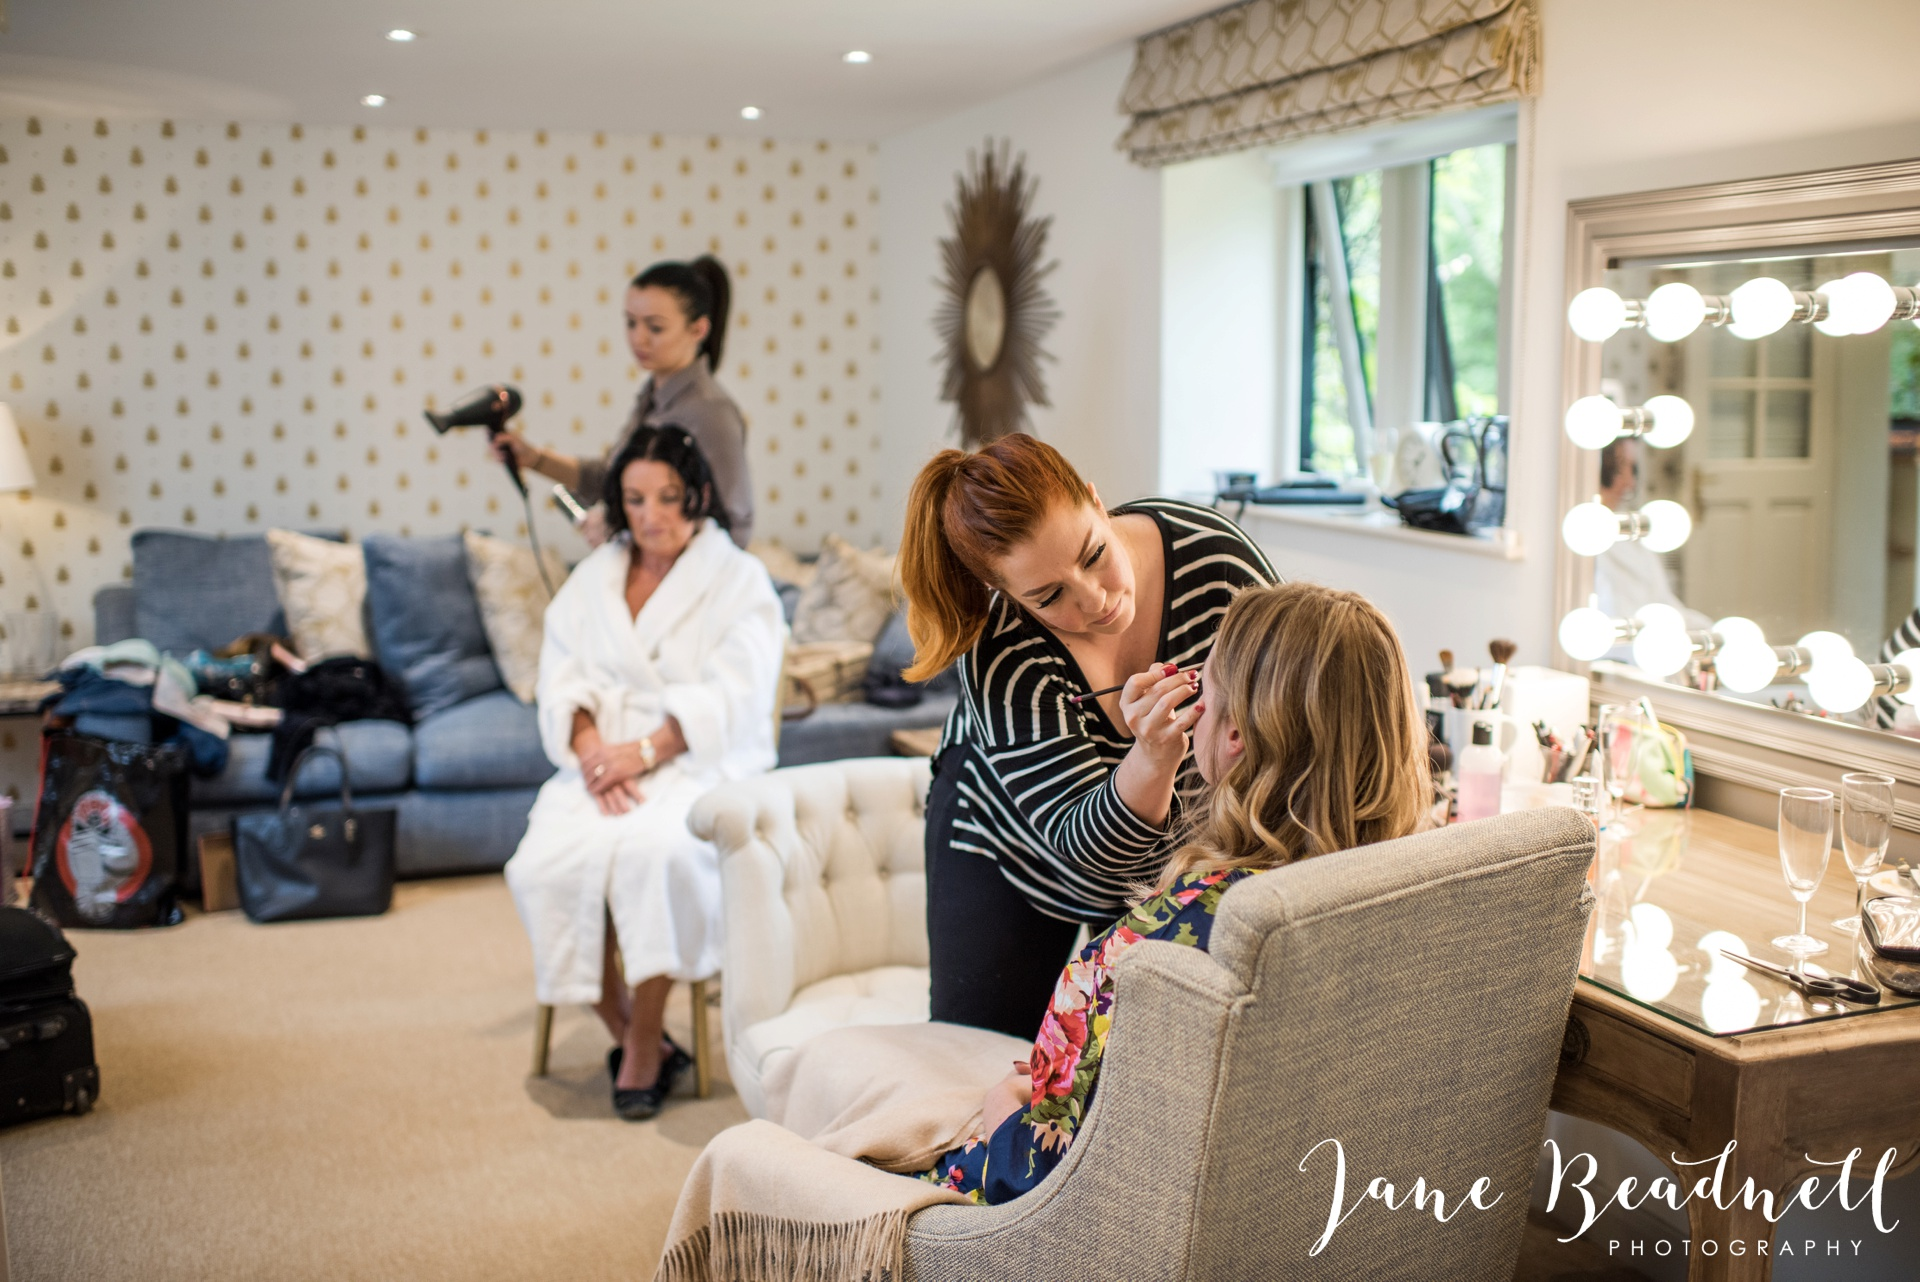 South Farm Wedding photography Hertfordshire by Jane Beadnell Photography fine art wedding photographer_0007